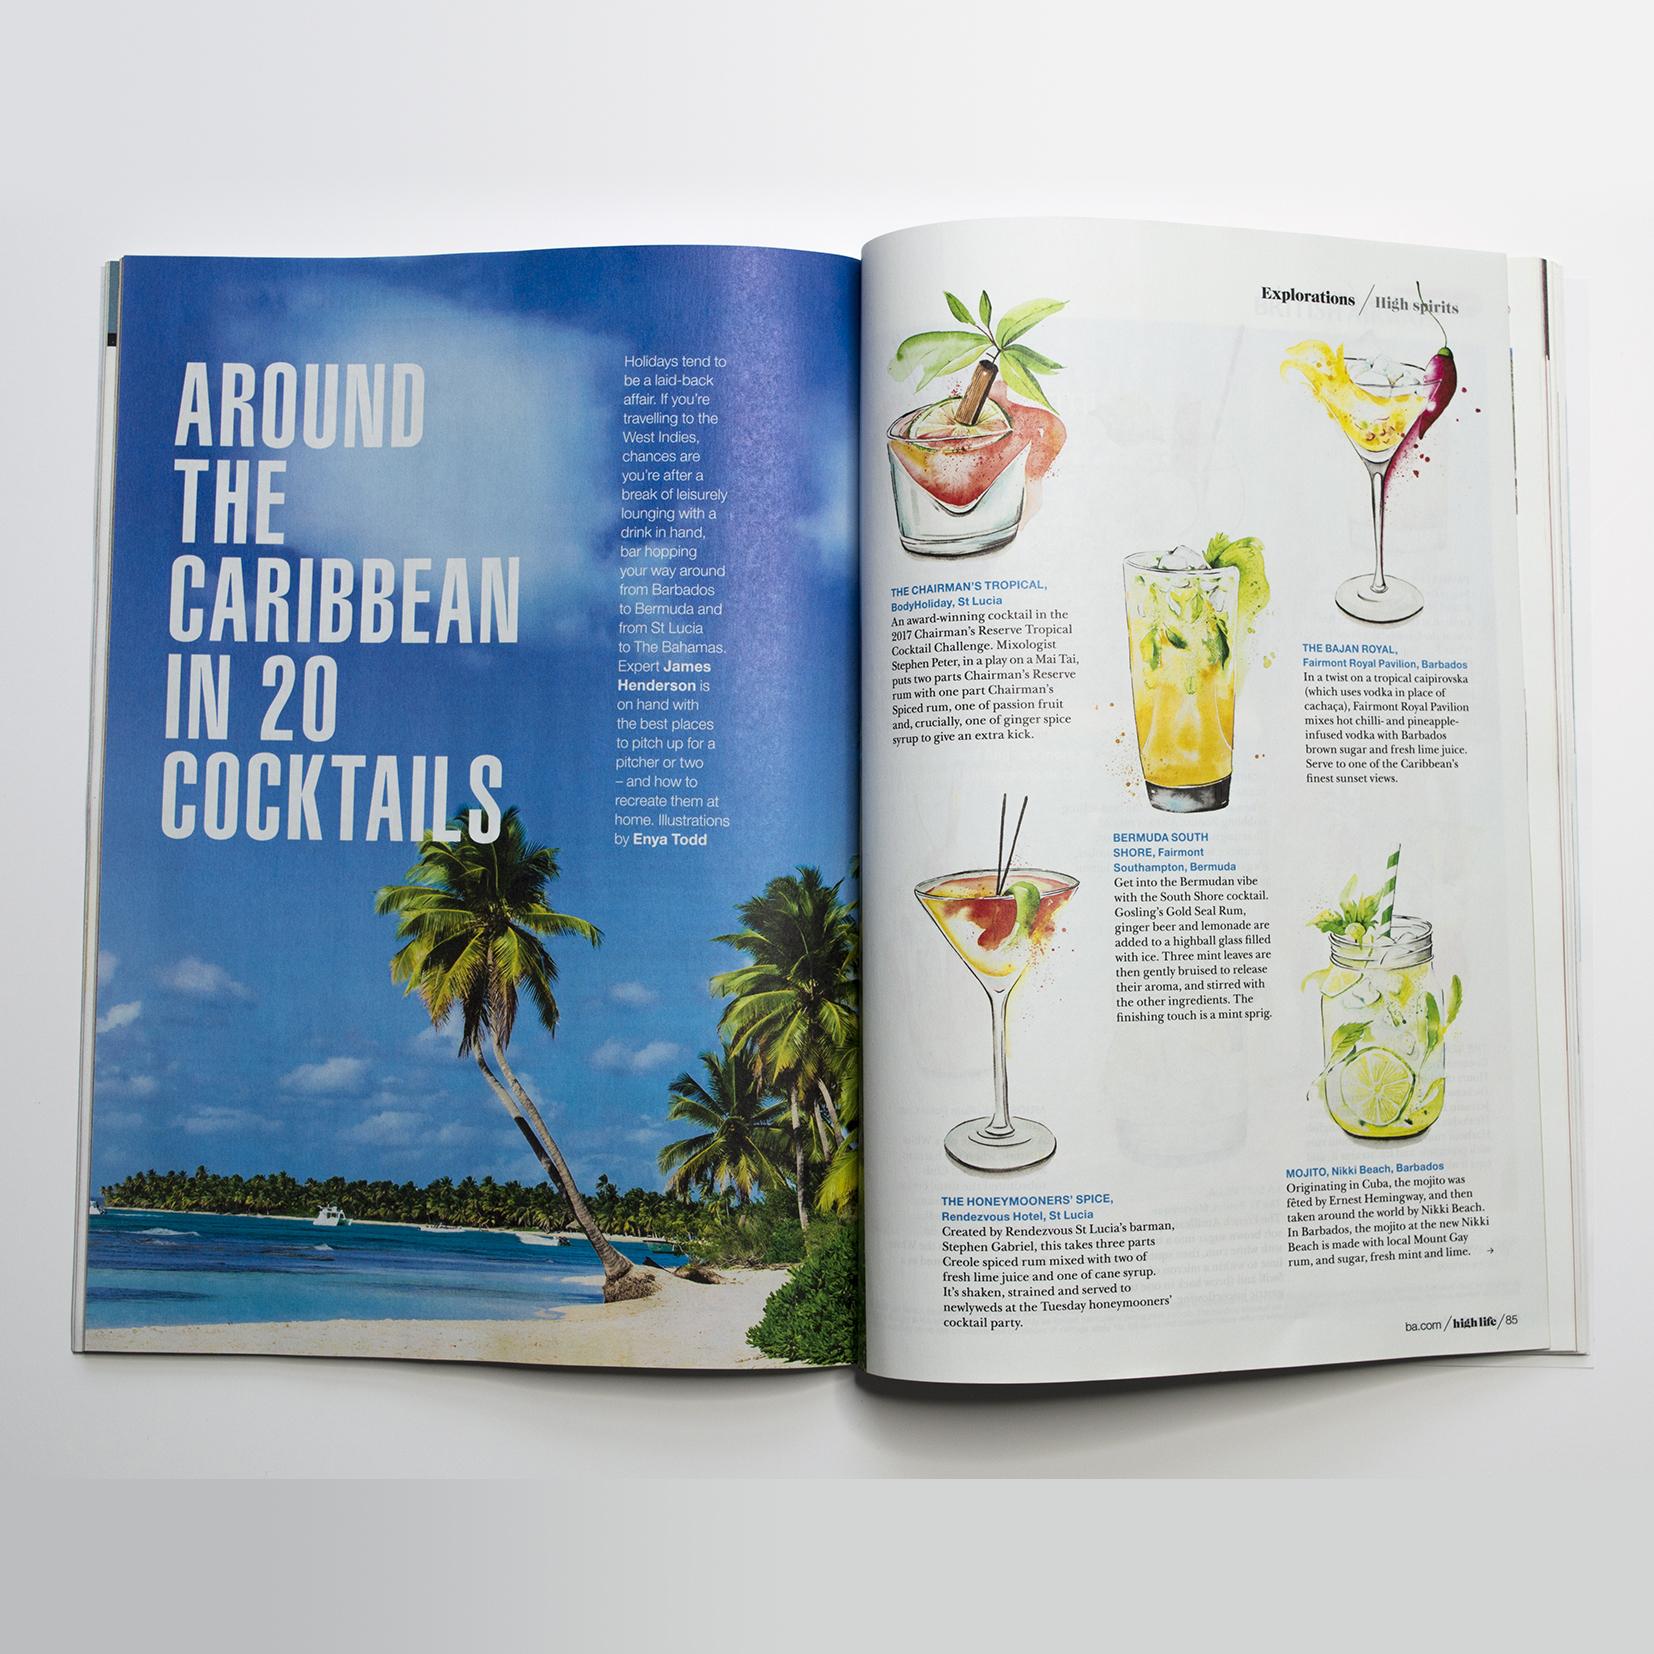 British Airways Inflight Magazine